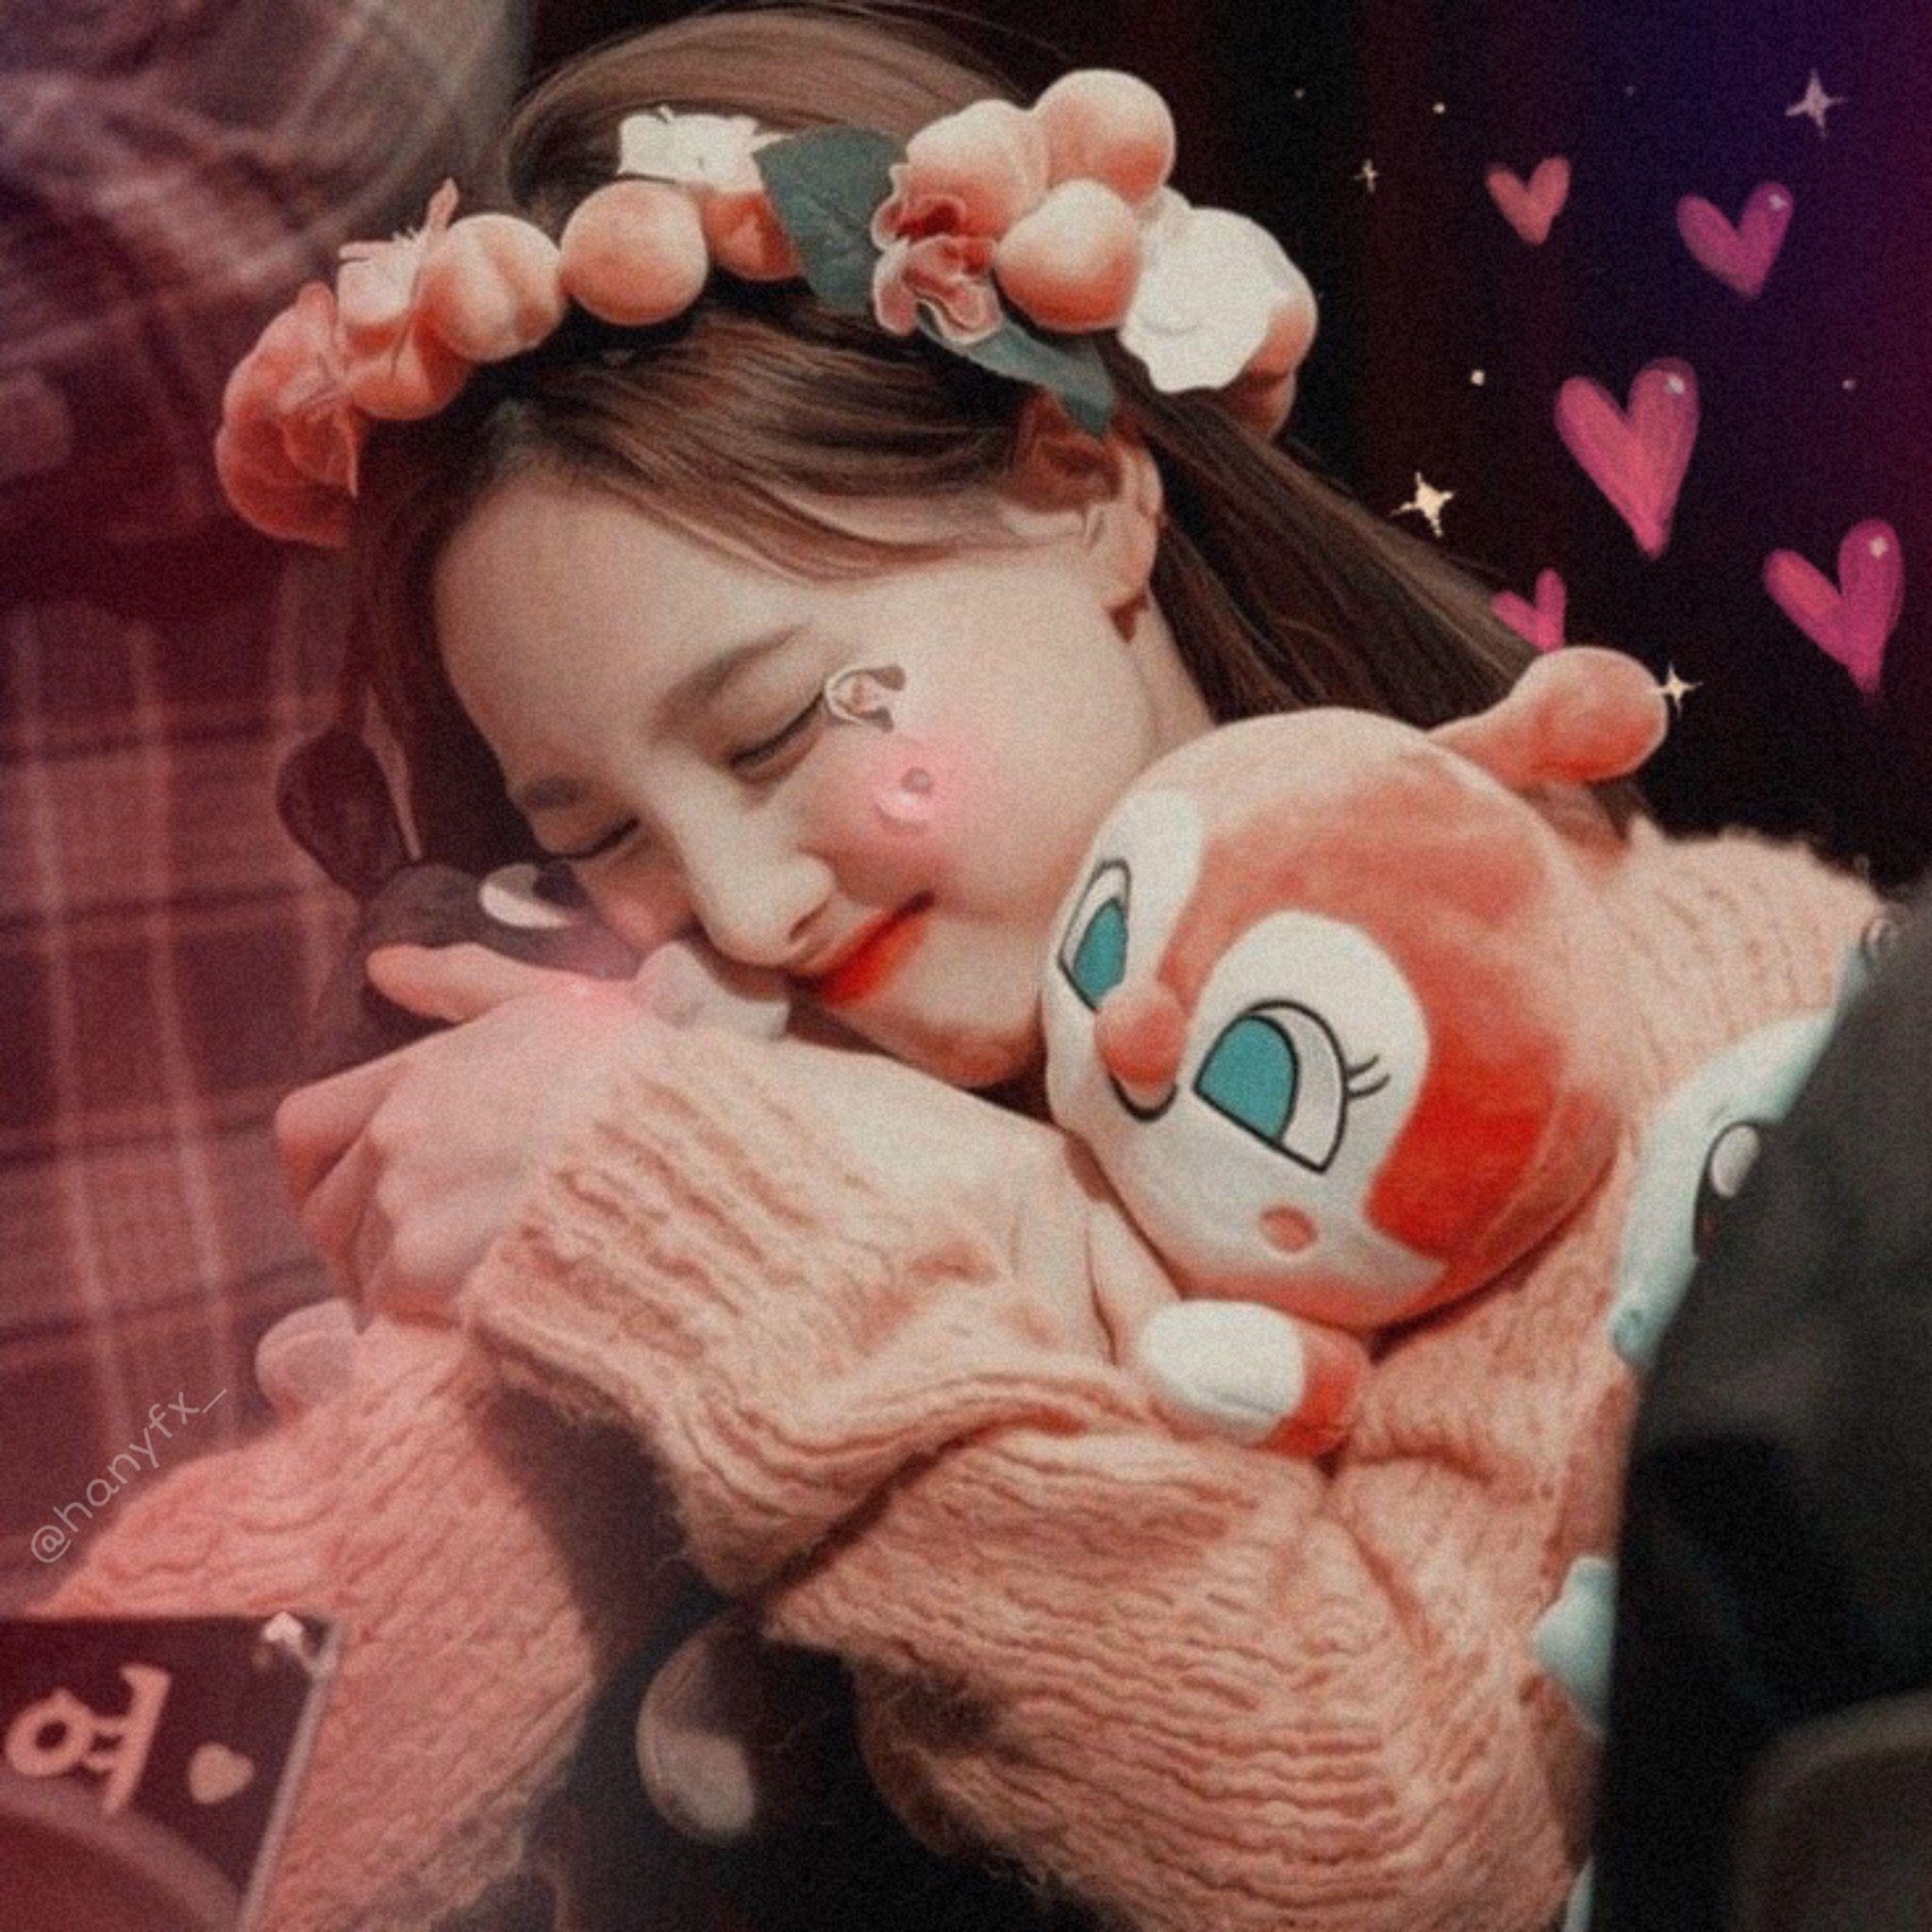 Im Nayeon Nayeon, Fotos de perfil whatsapp, Fotos de perfil